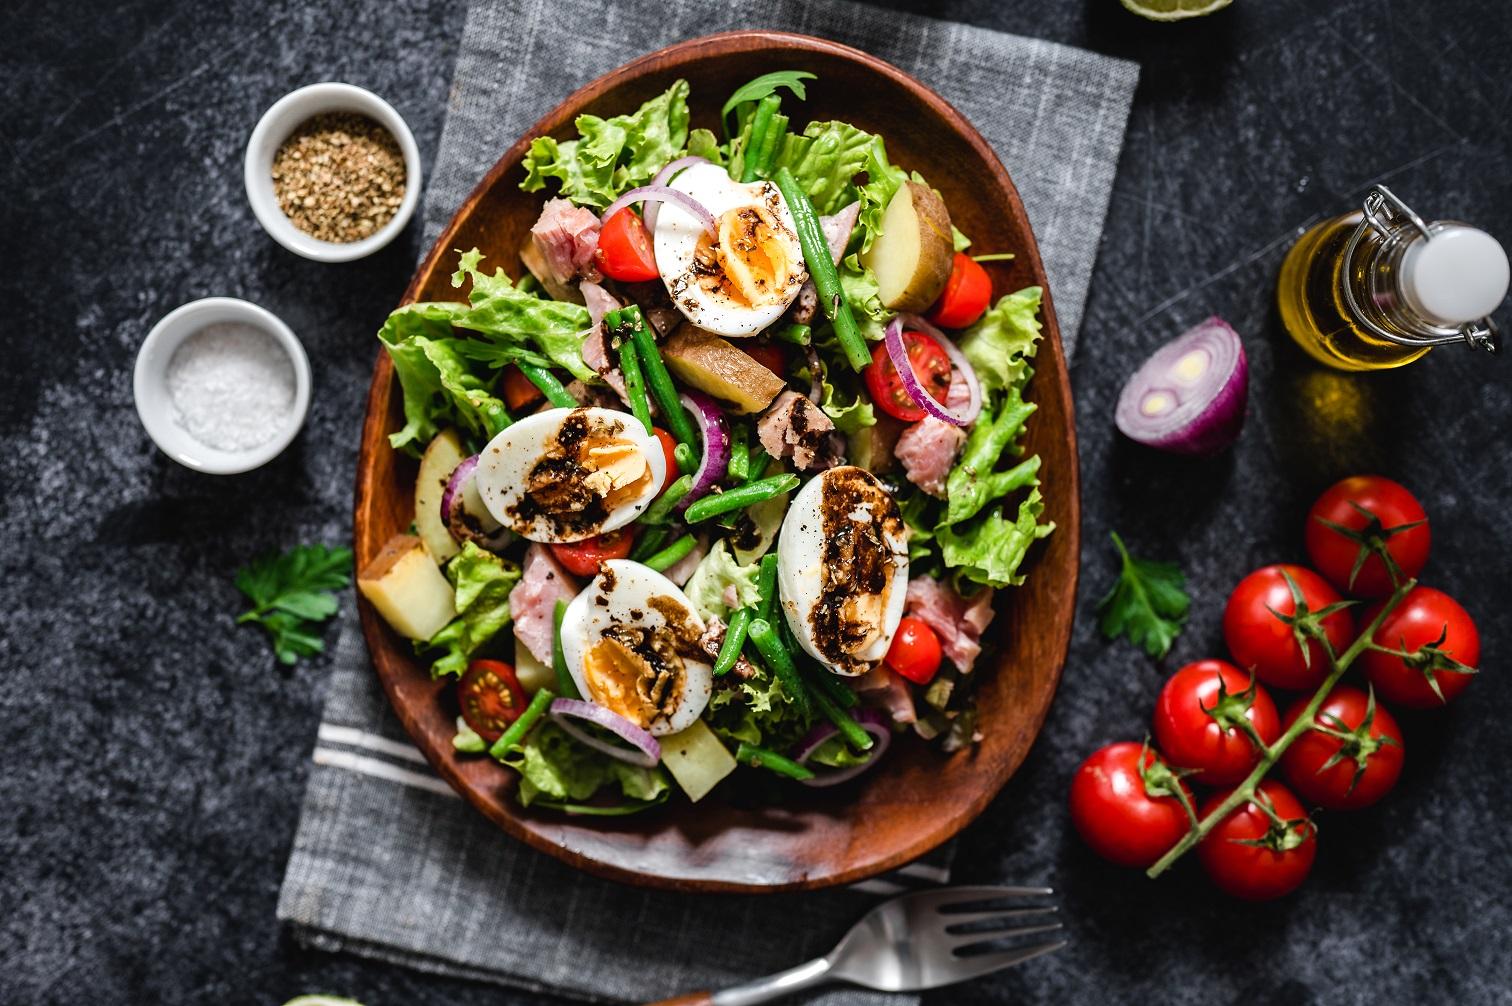 Salade nicoise met zwarte knoflook dressing